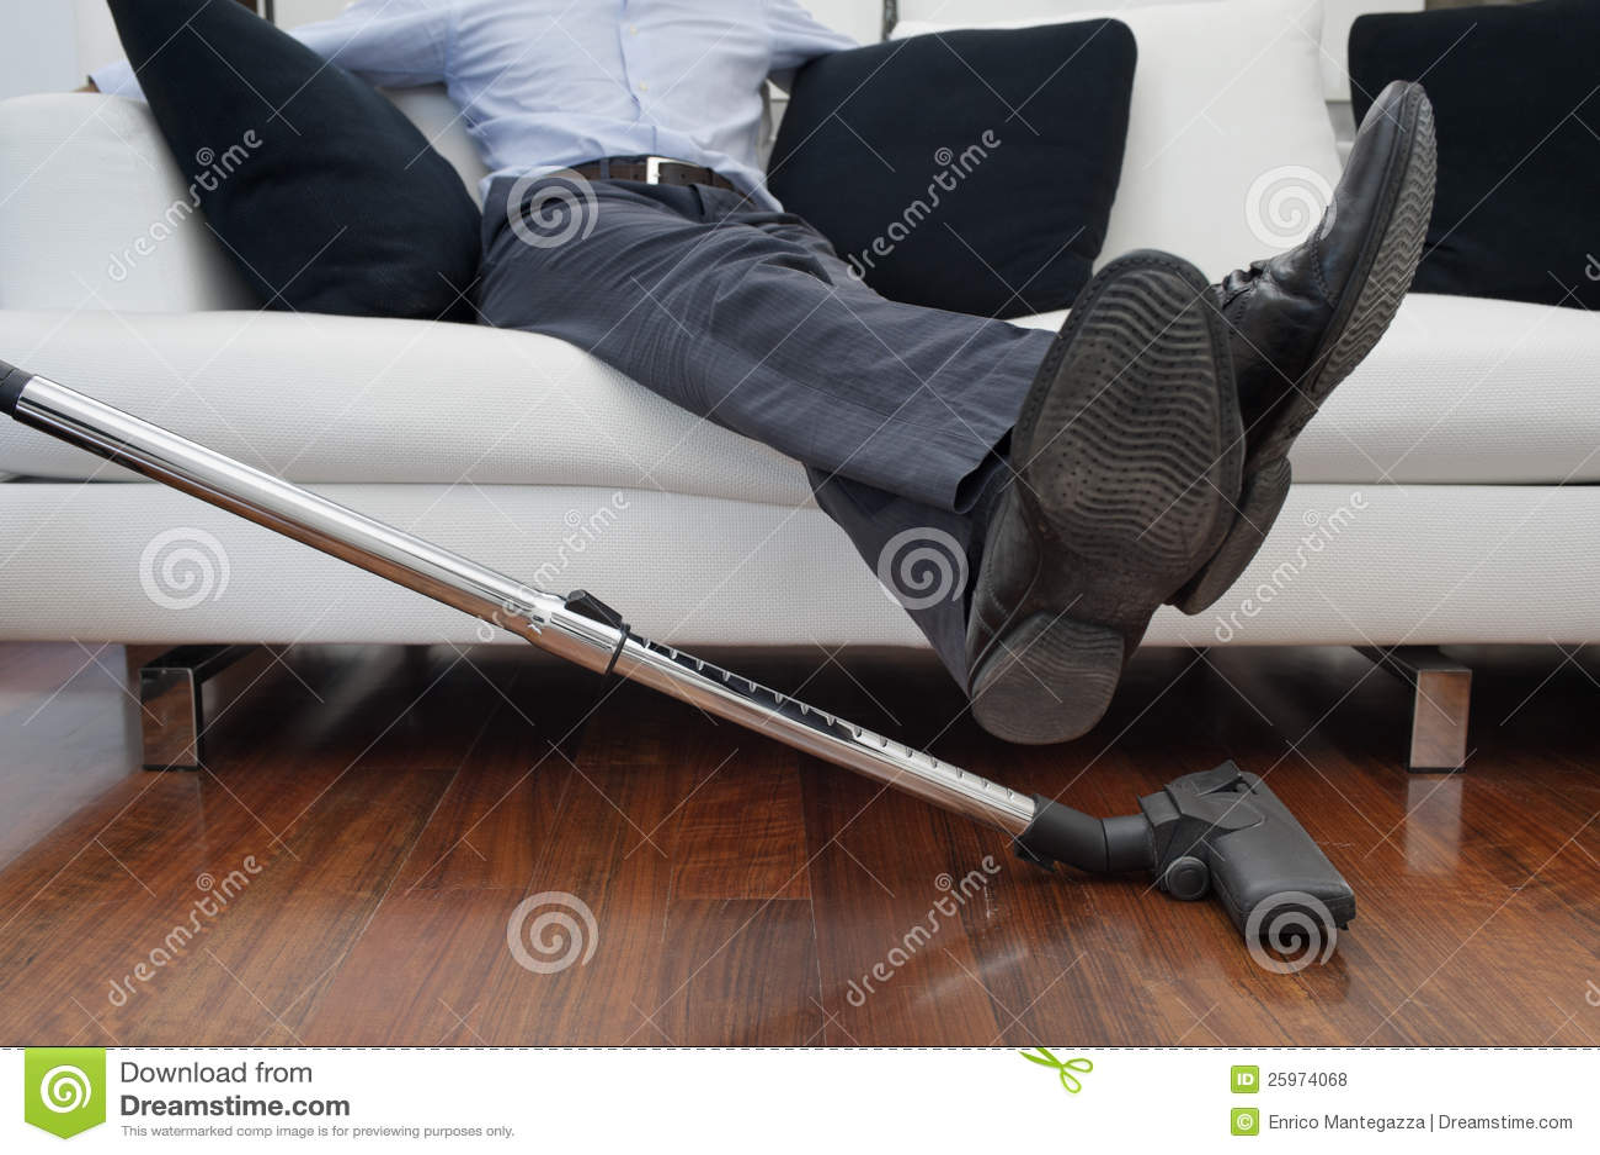 haus putzen lizenzfreie stockfotos bild 25974068. Black Bedroom Furniture Sets. Home Design Ideas